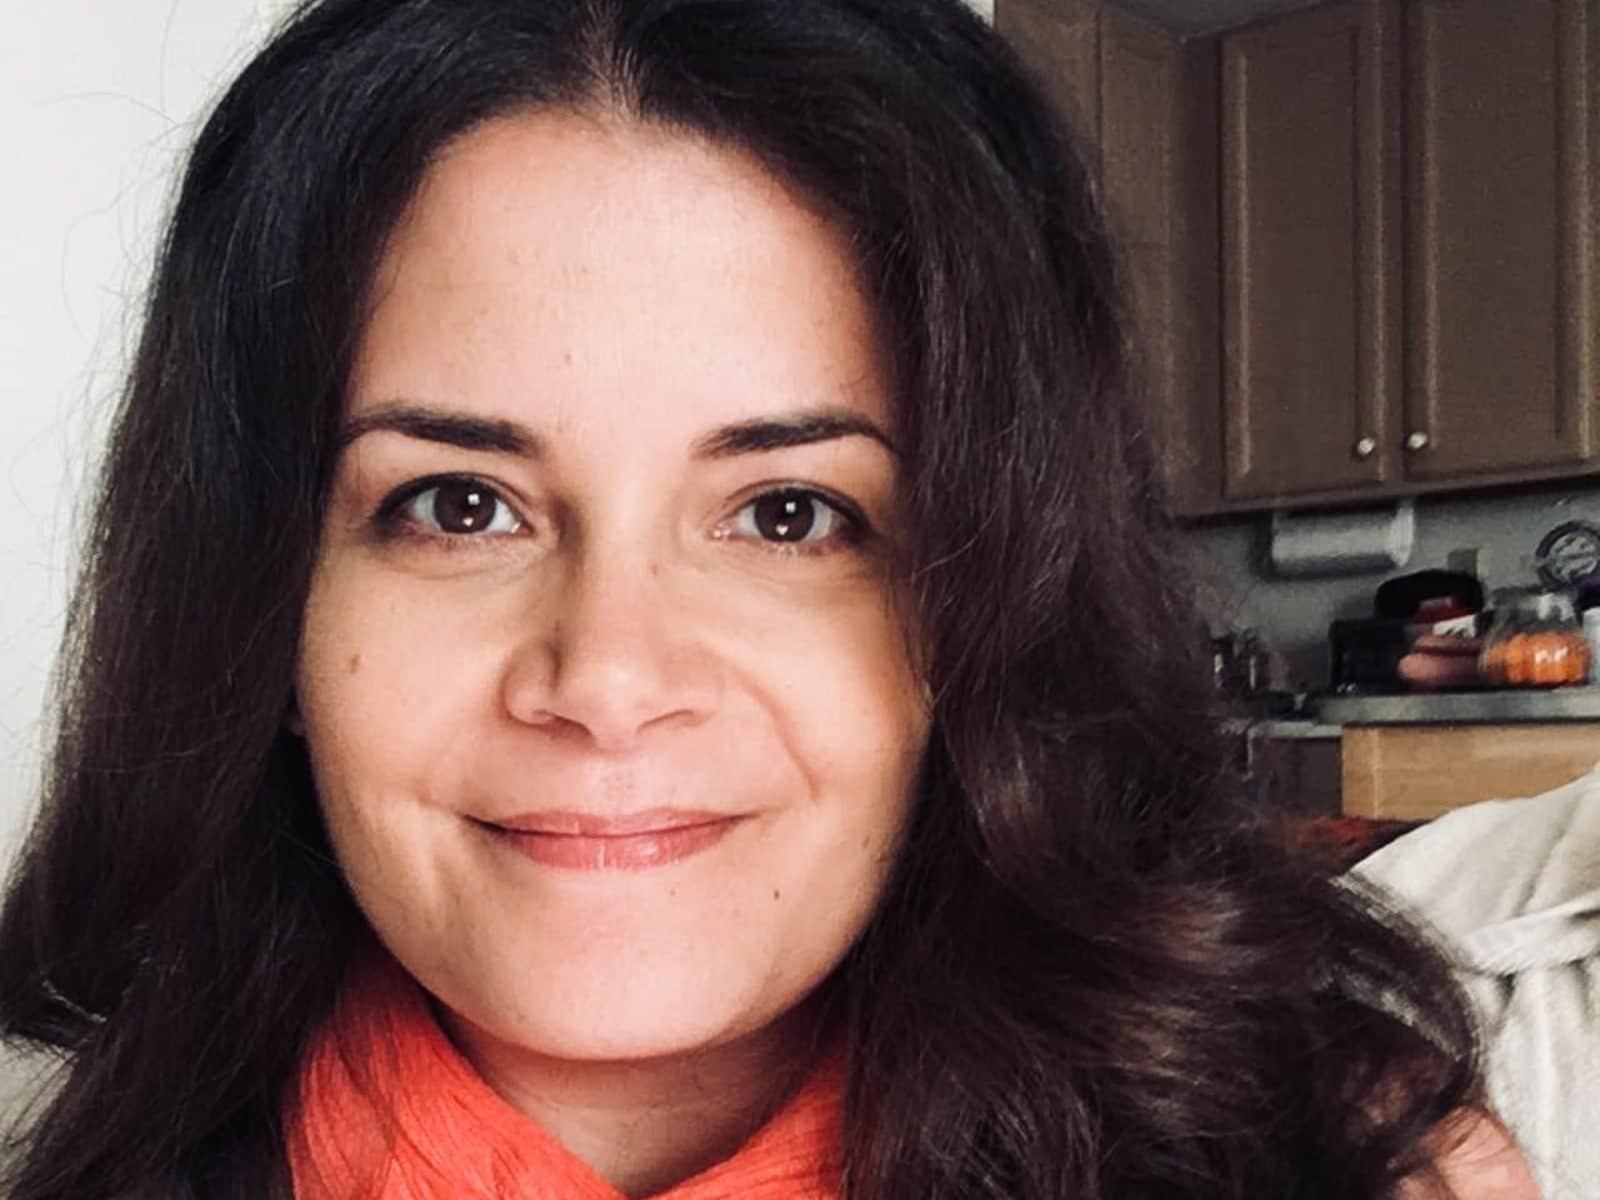 Miriam from San Francisco, California, United States